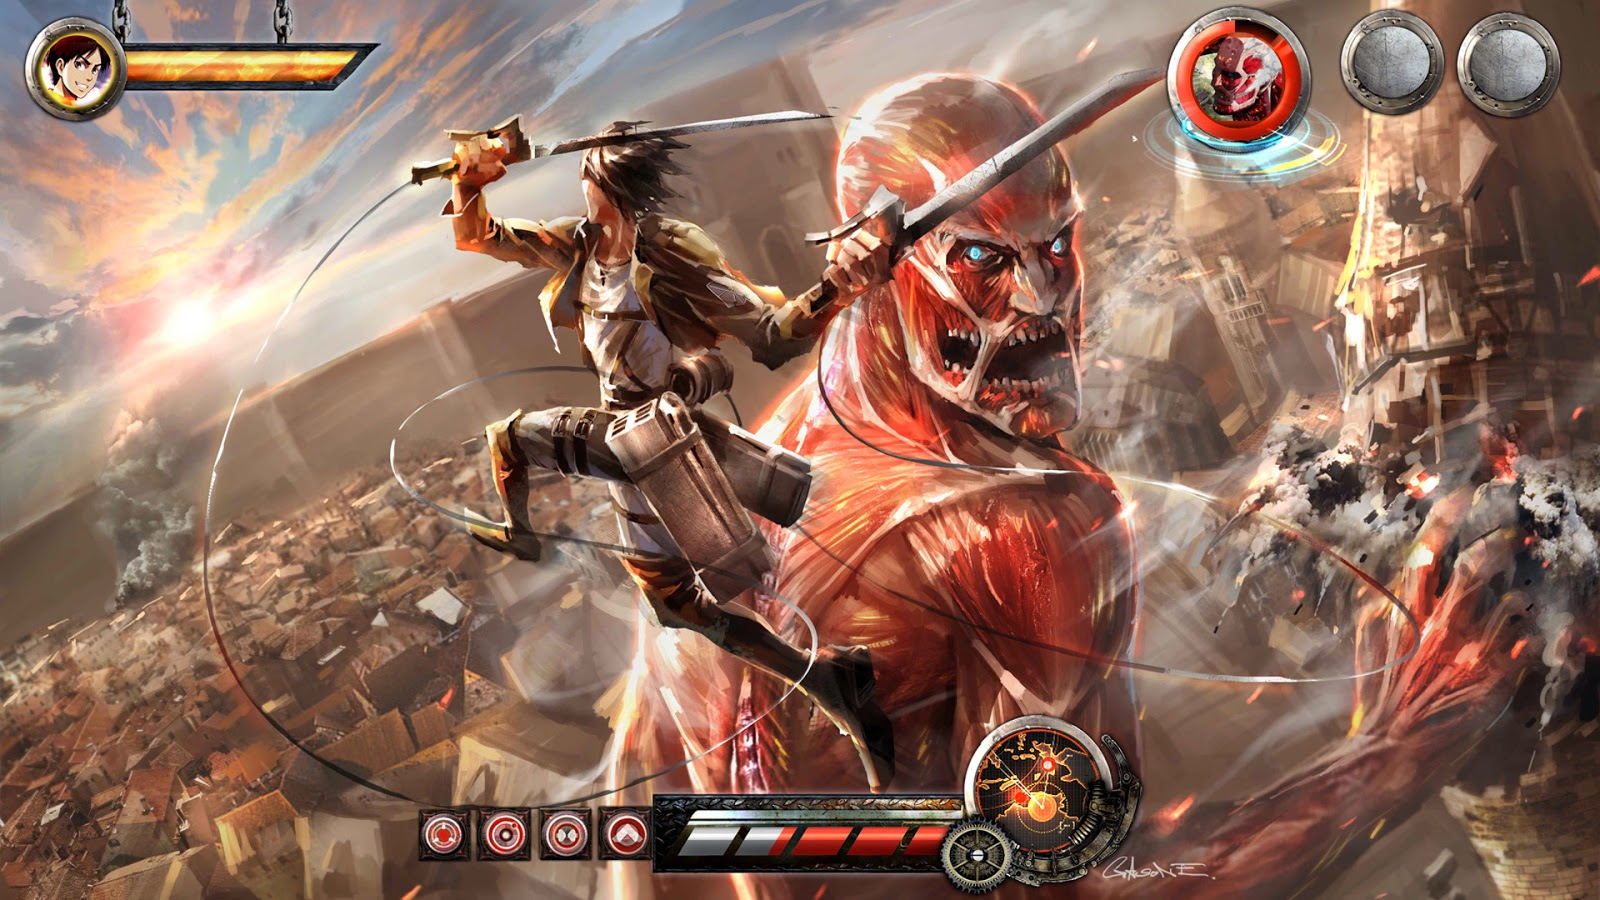 Free Download Titan Video Game Attack On Titan Shingeki No Kyojin Anime Hd Wallpaper 1600x900 For Your Desktop Mobile Tablet Explore 49 Attack On Titan Hd Wallpaper Attack On